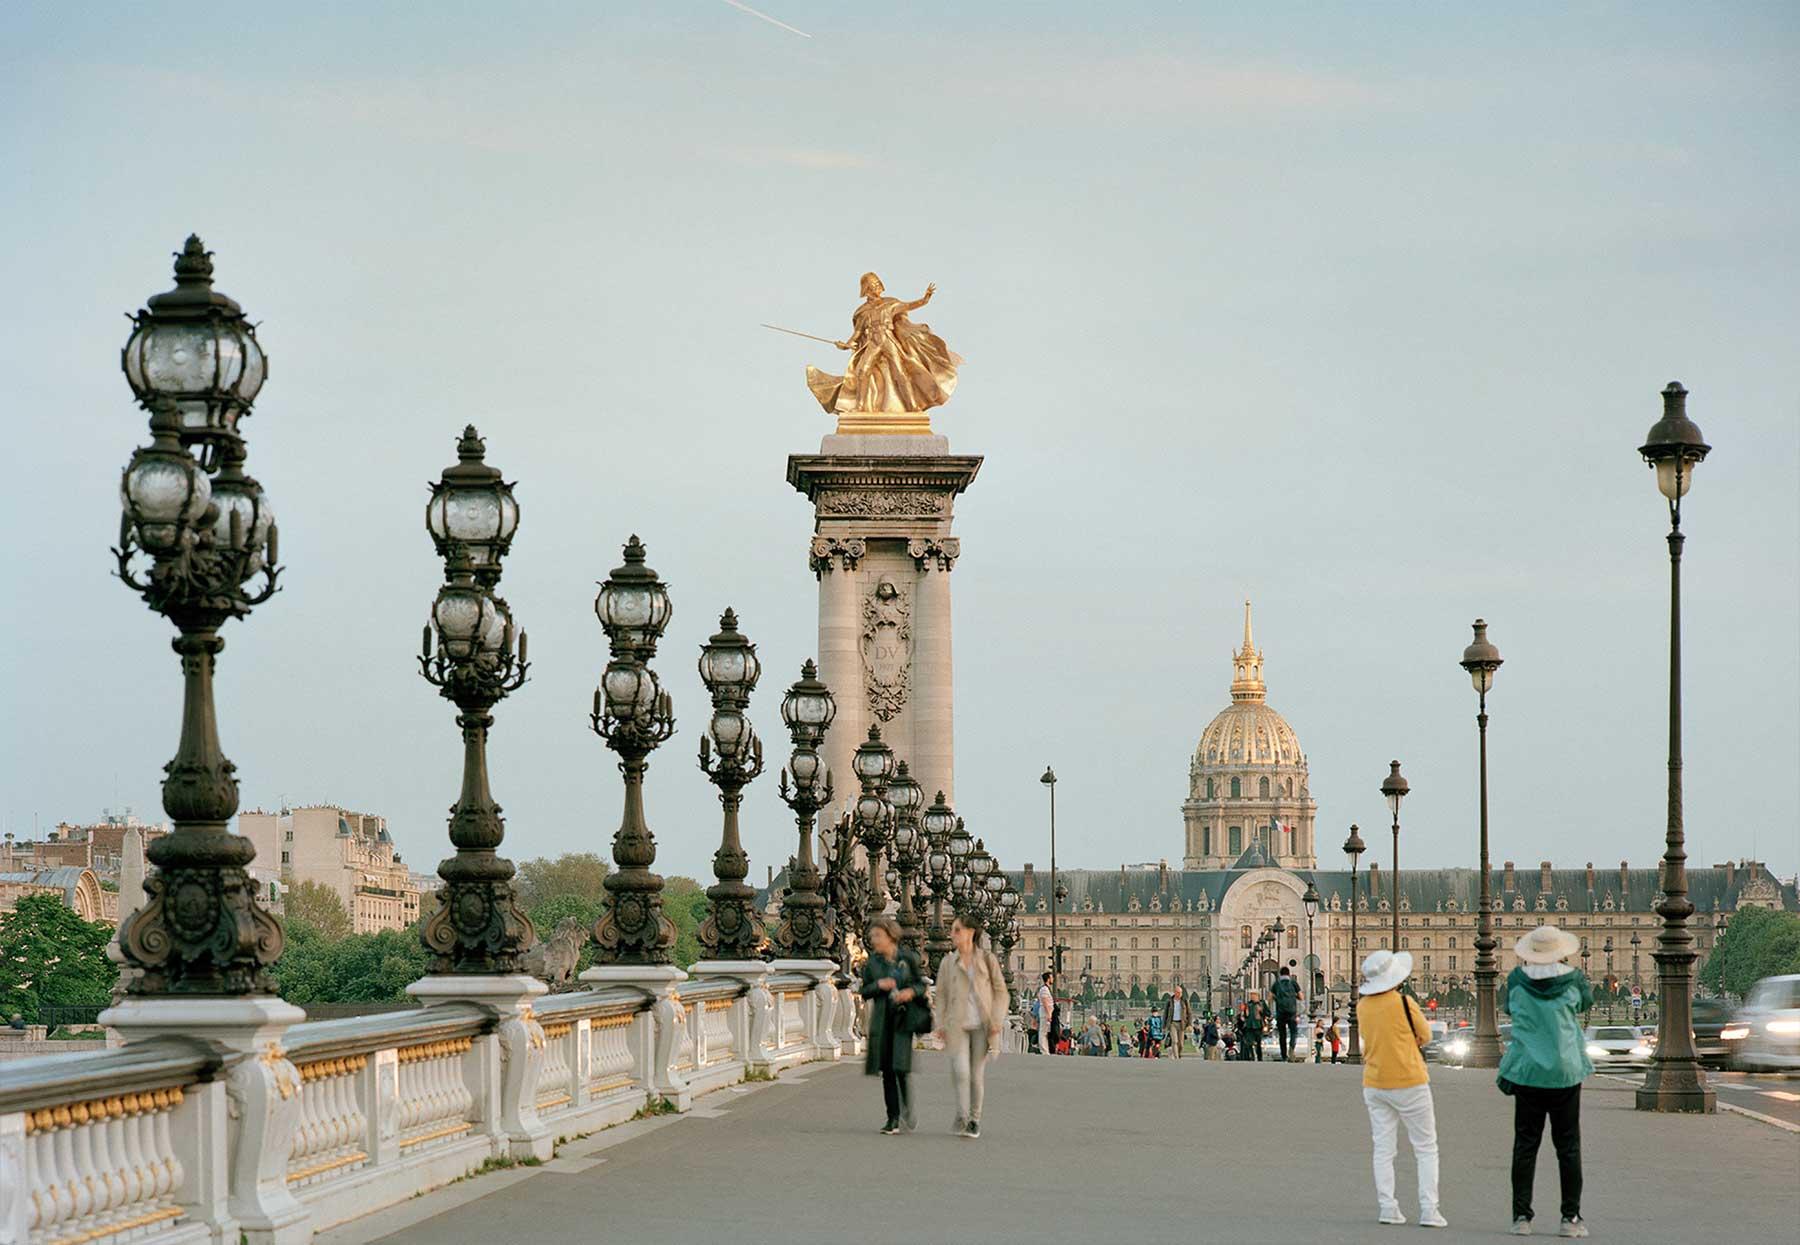 Popkulturen-Statuen Monuments_Benoit-Lapray_03